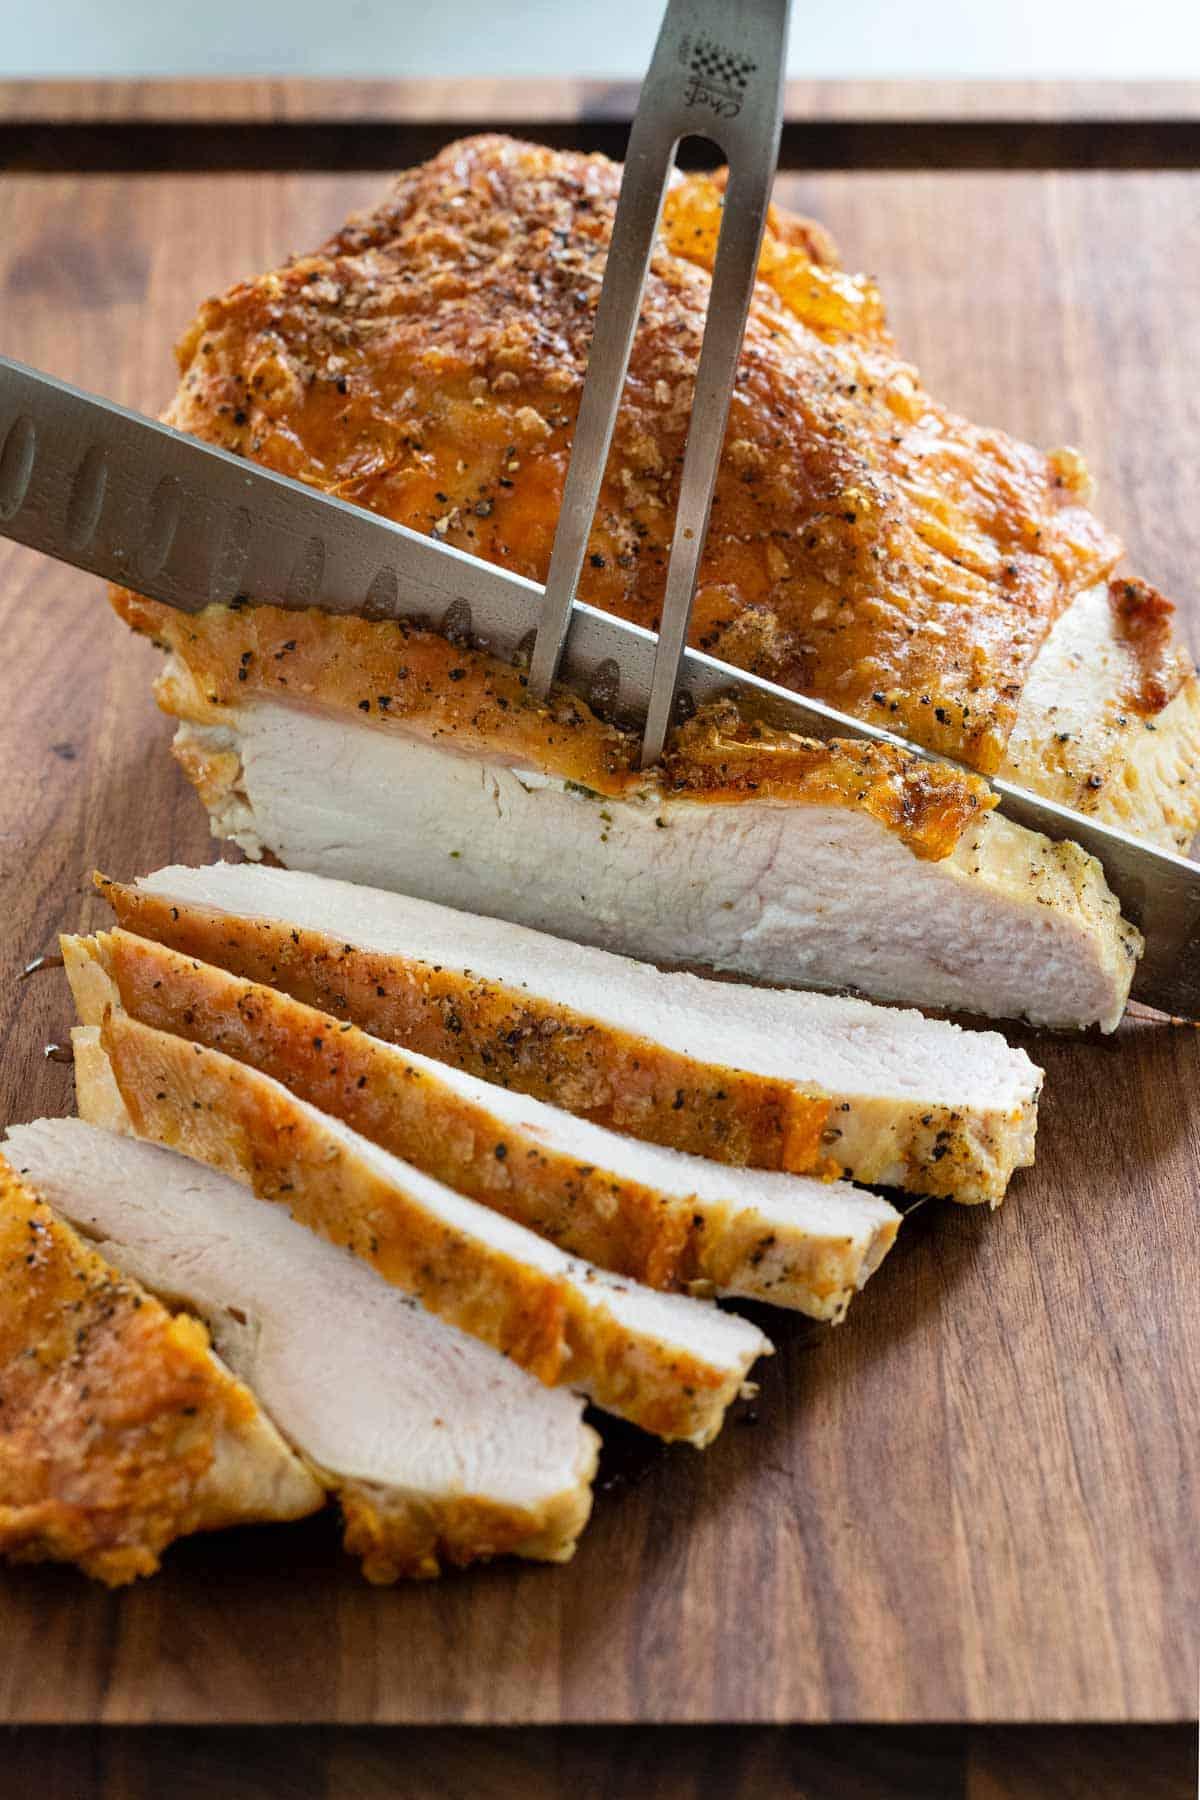 roast turkey breast being sliced with a knife on a cutting board